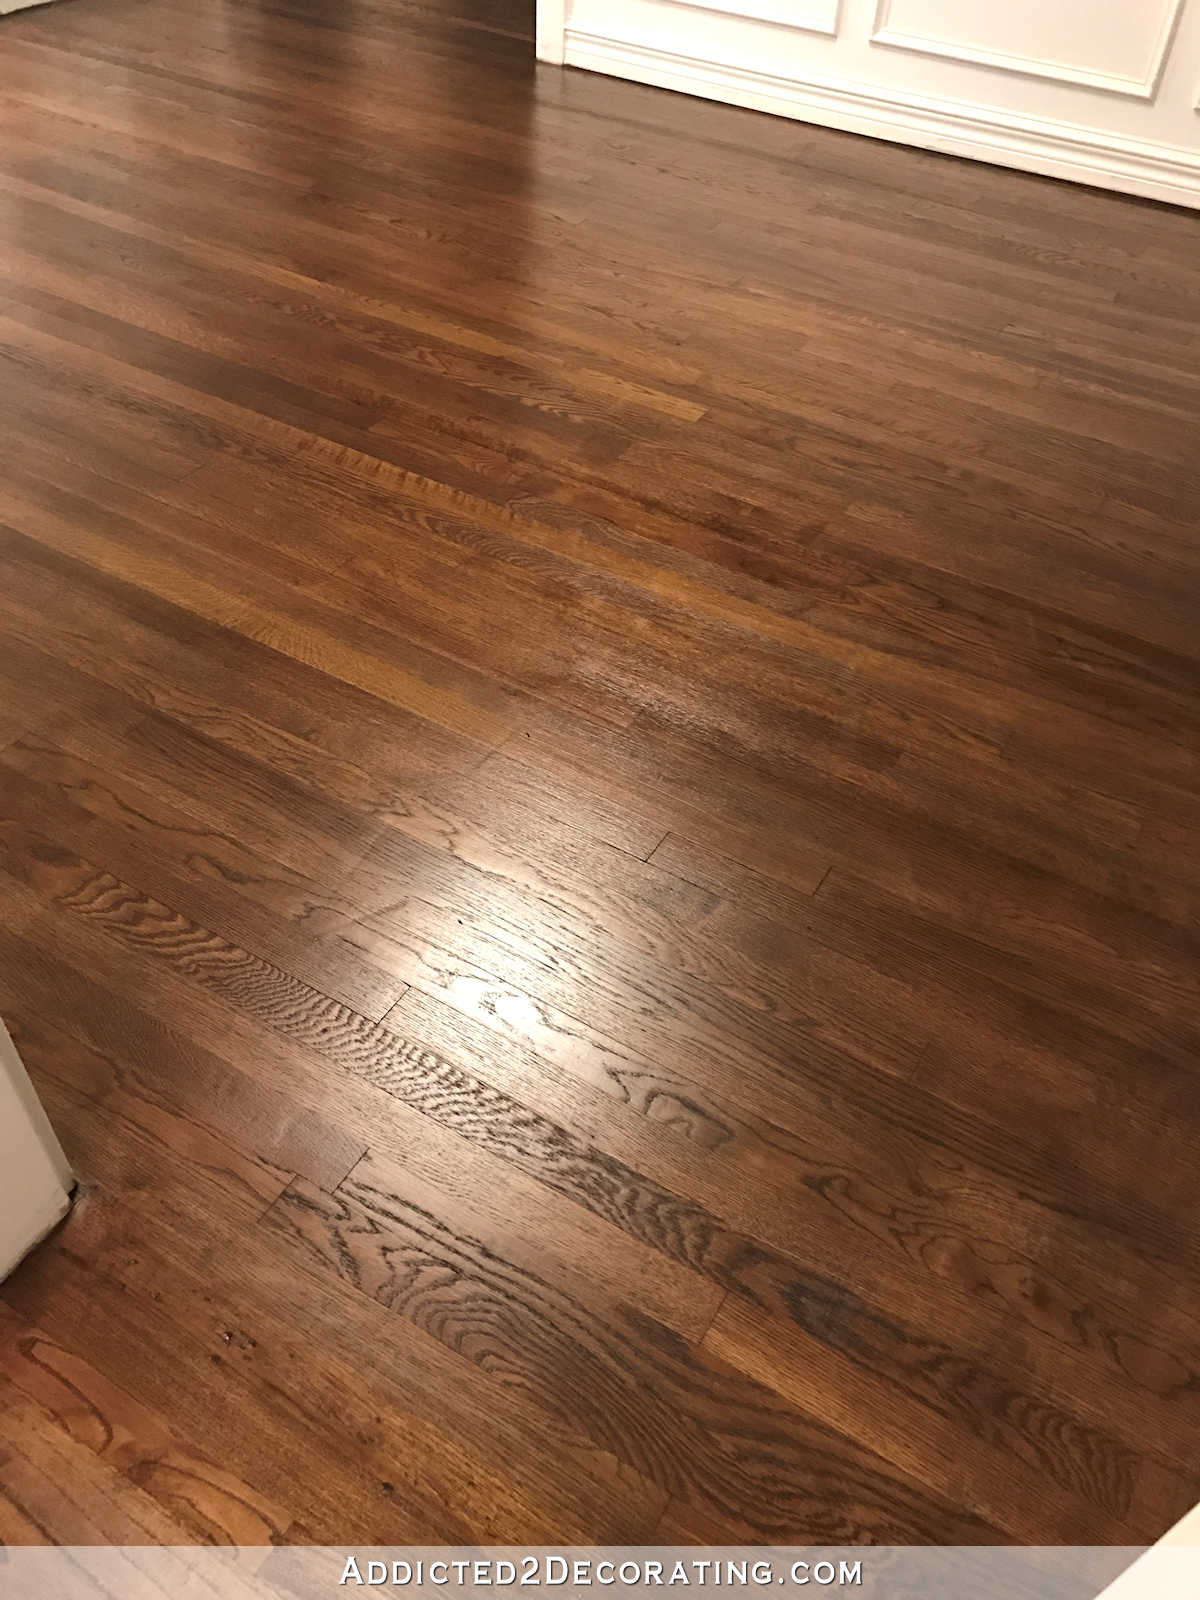 hardwood floor restoration chicago of hardwood floor refinishing chicago hardwood flooring somerset high with gallery of hardwood floor refinishing chicago hardwood flooring somerset high gloss 2 1 4 width natural red